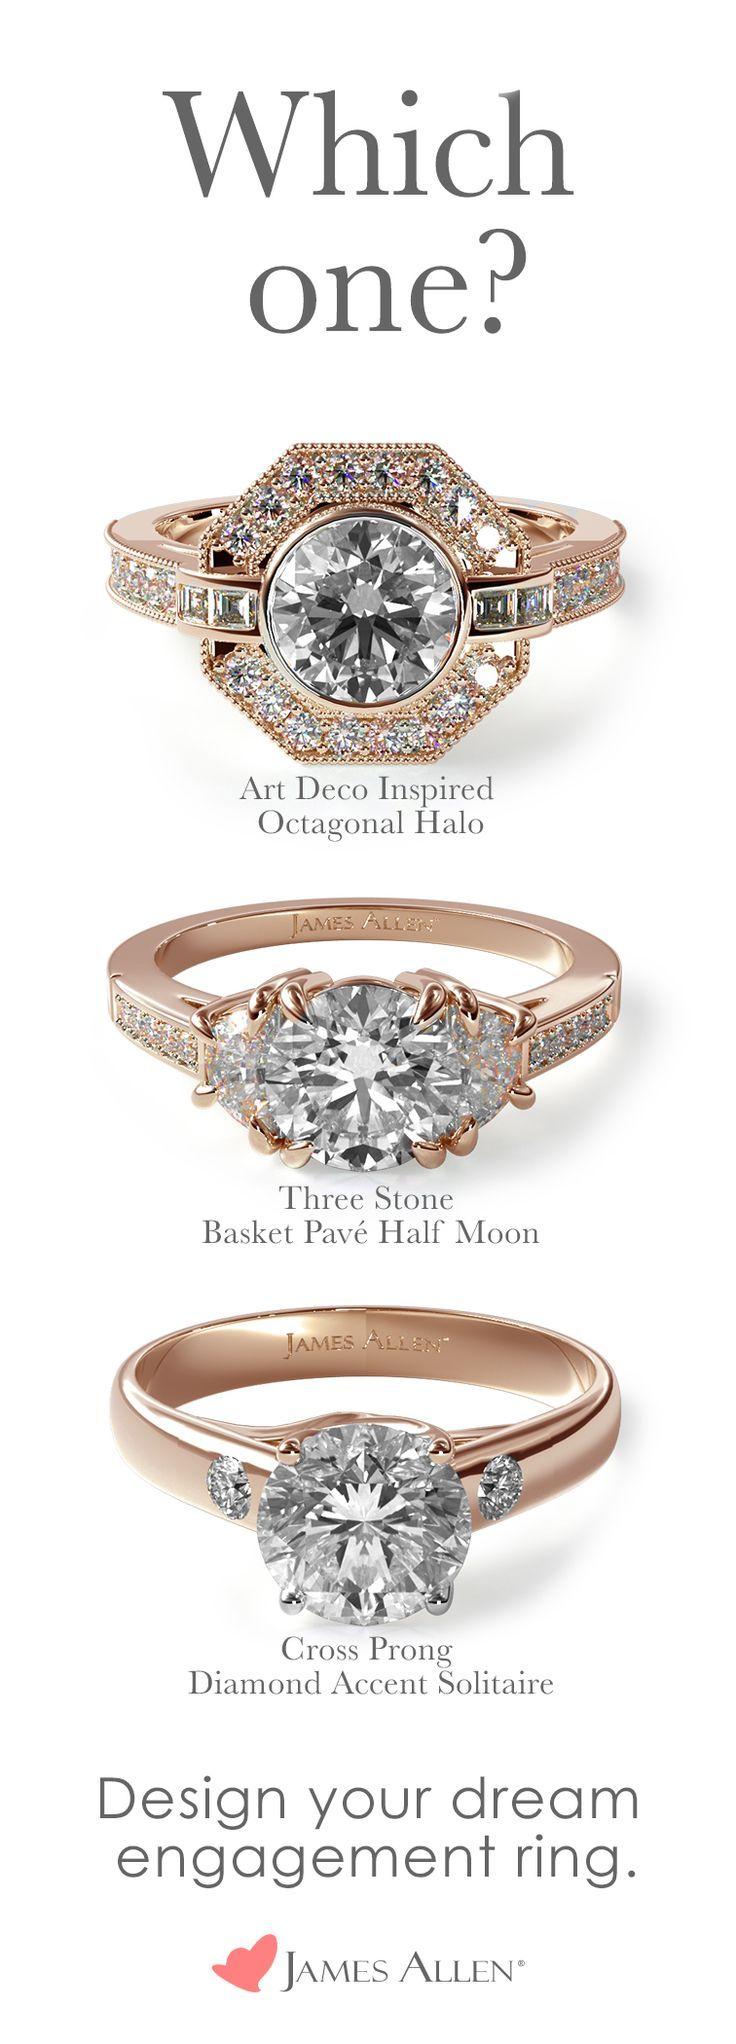 Diamond Rings Hundreds Of Stunning Rose Gold Engagement Ring Styles With 100 000 Loose Diamo Youfashion Net Leading Fashion Lifestyle Magazine Dream Engagement Rings Engagement Rings Shop Engagement Rings